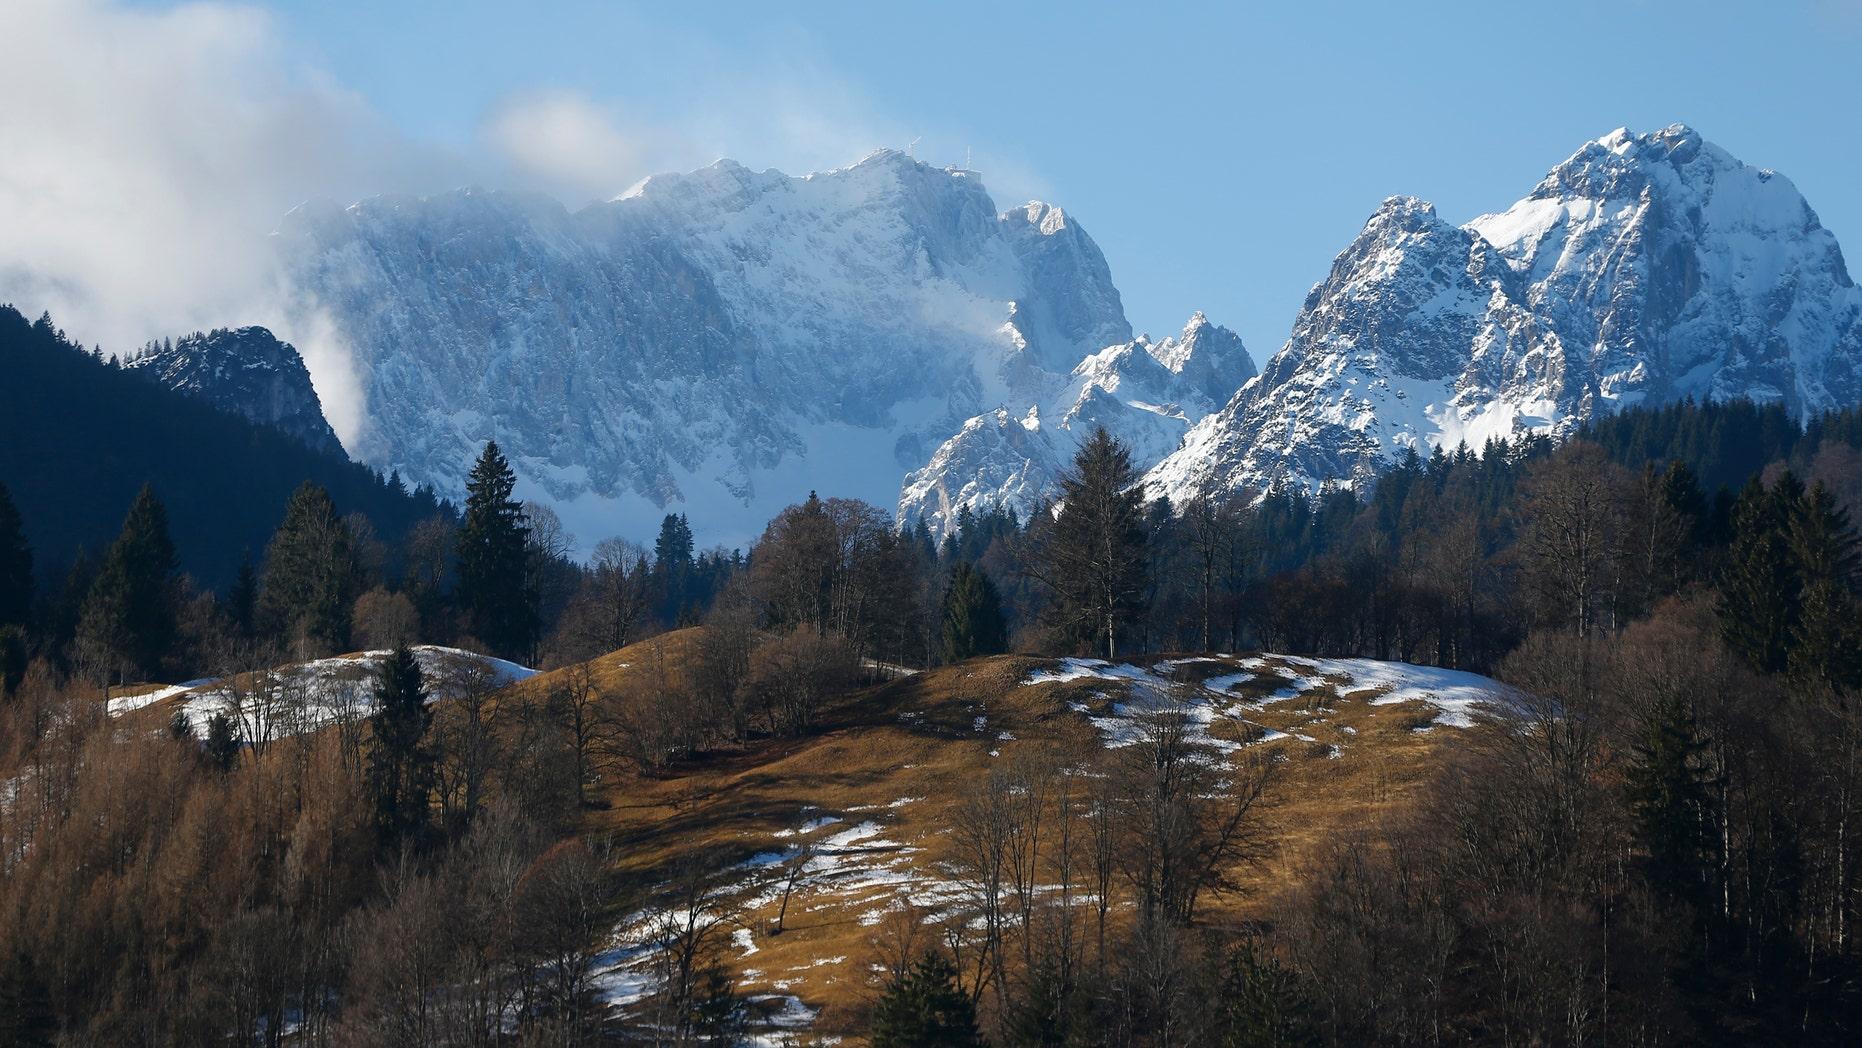 Germany's highest mountain, 9,718 feet Zugspitze (L) is pictured from the Bavarian ski resort of Garmisch-Partenkirchen, Germany, Jan. 29, 2016. (REUTERS/Dominic Ebenbichler)